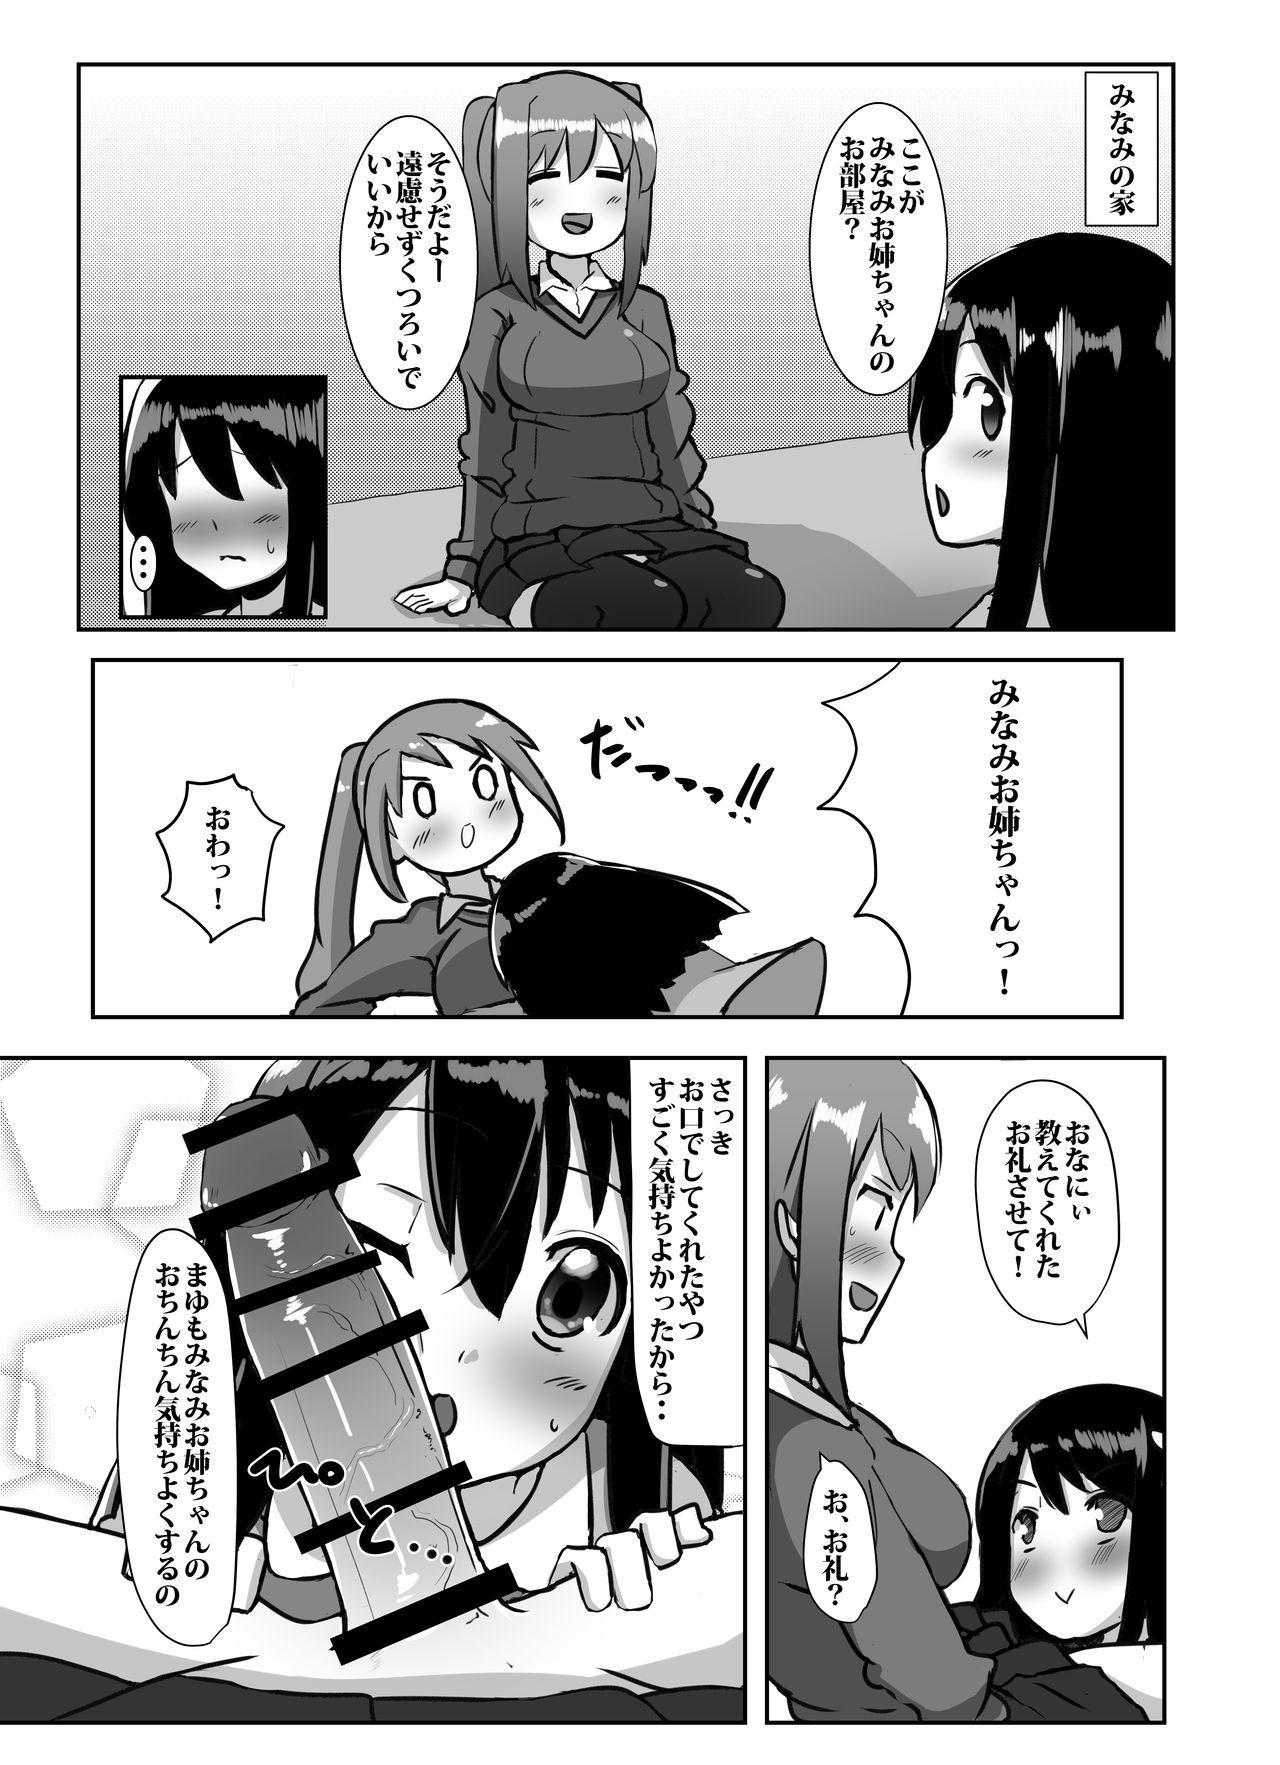 Futanari Musume ga Deattara 2 40